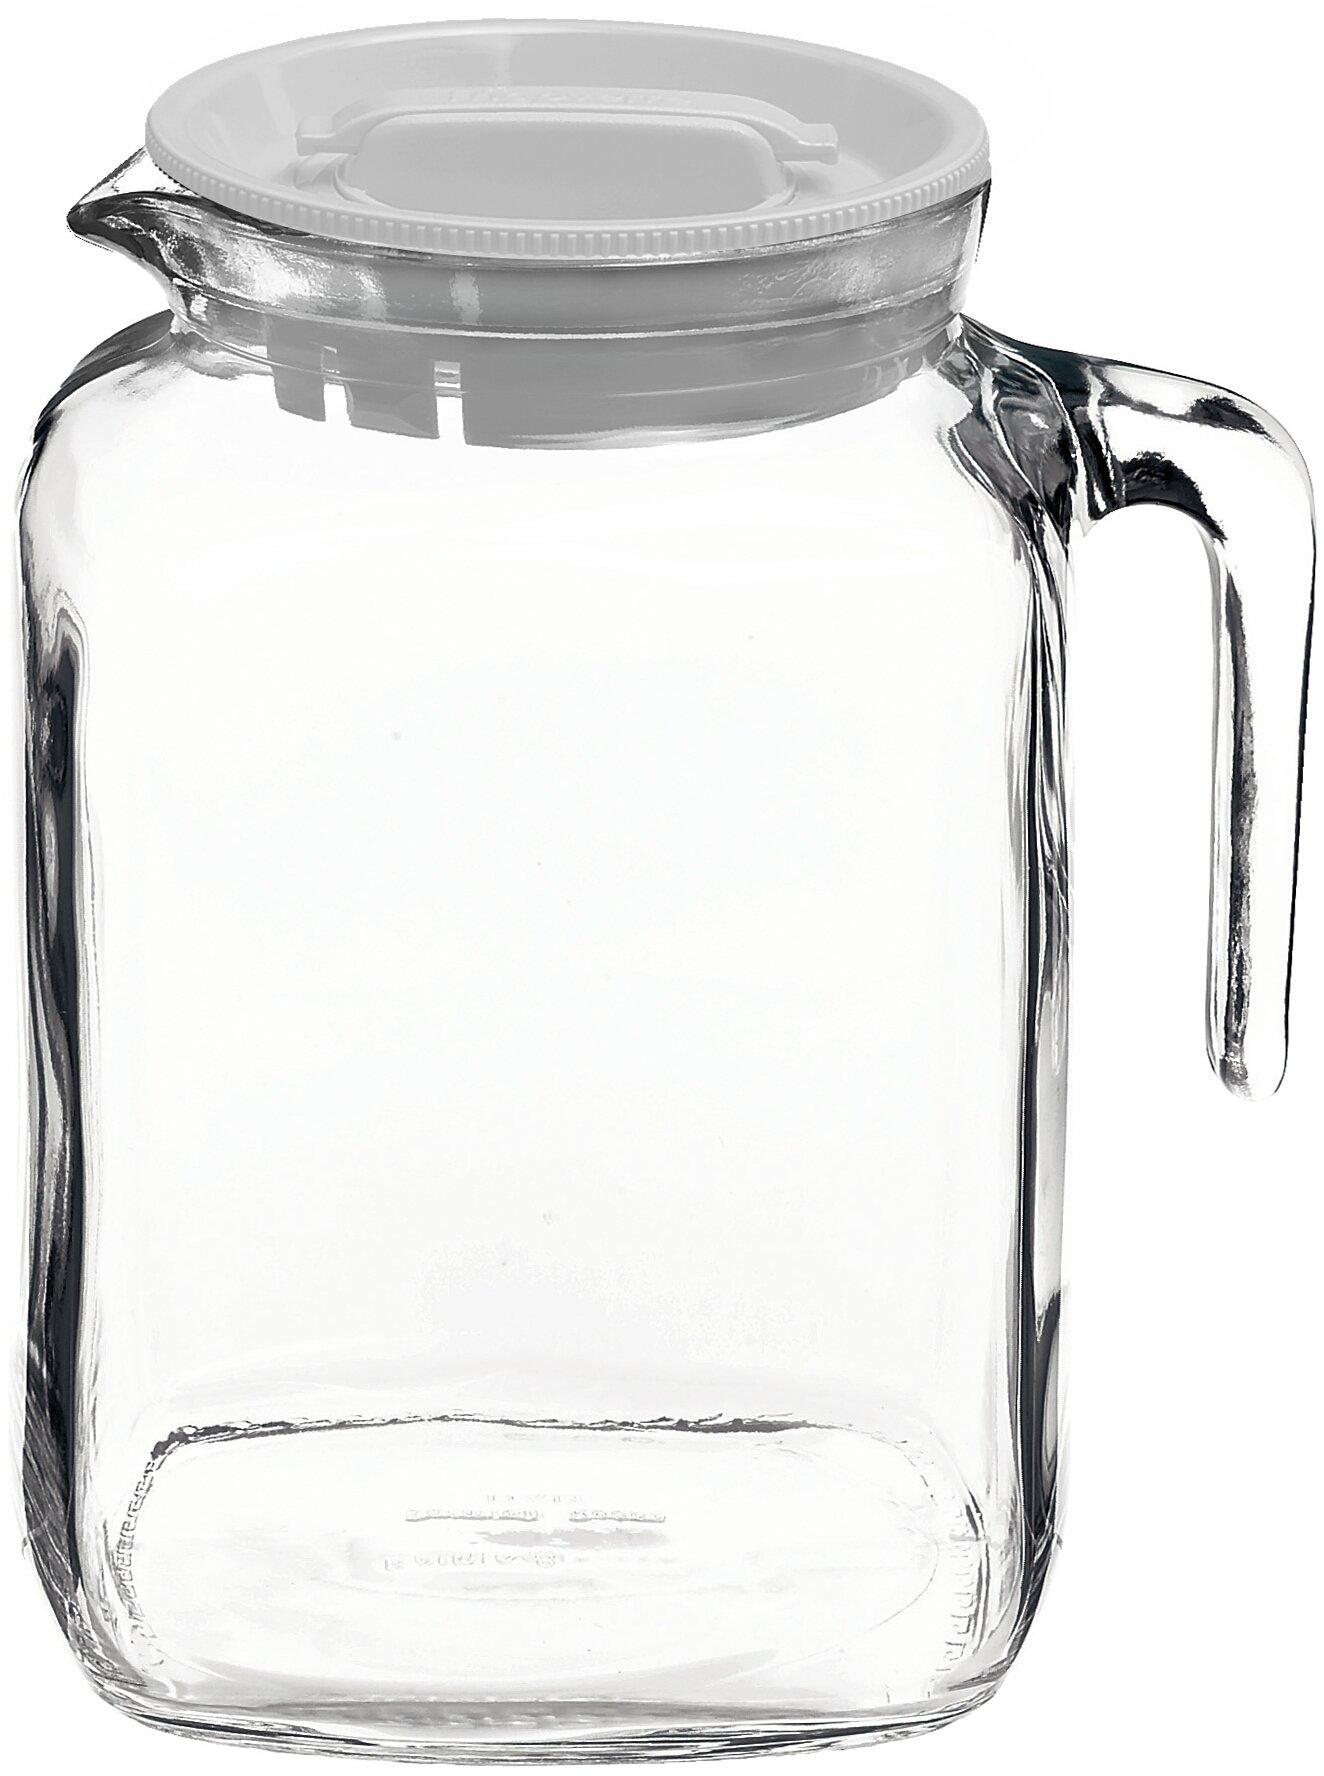 Frigoverre Glass Pitcher